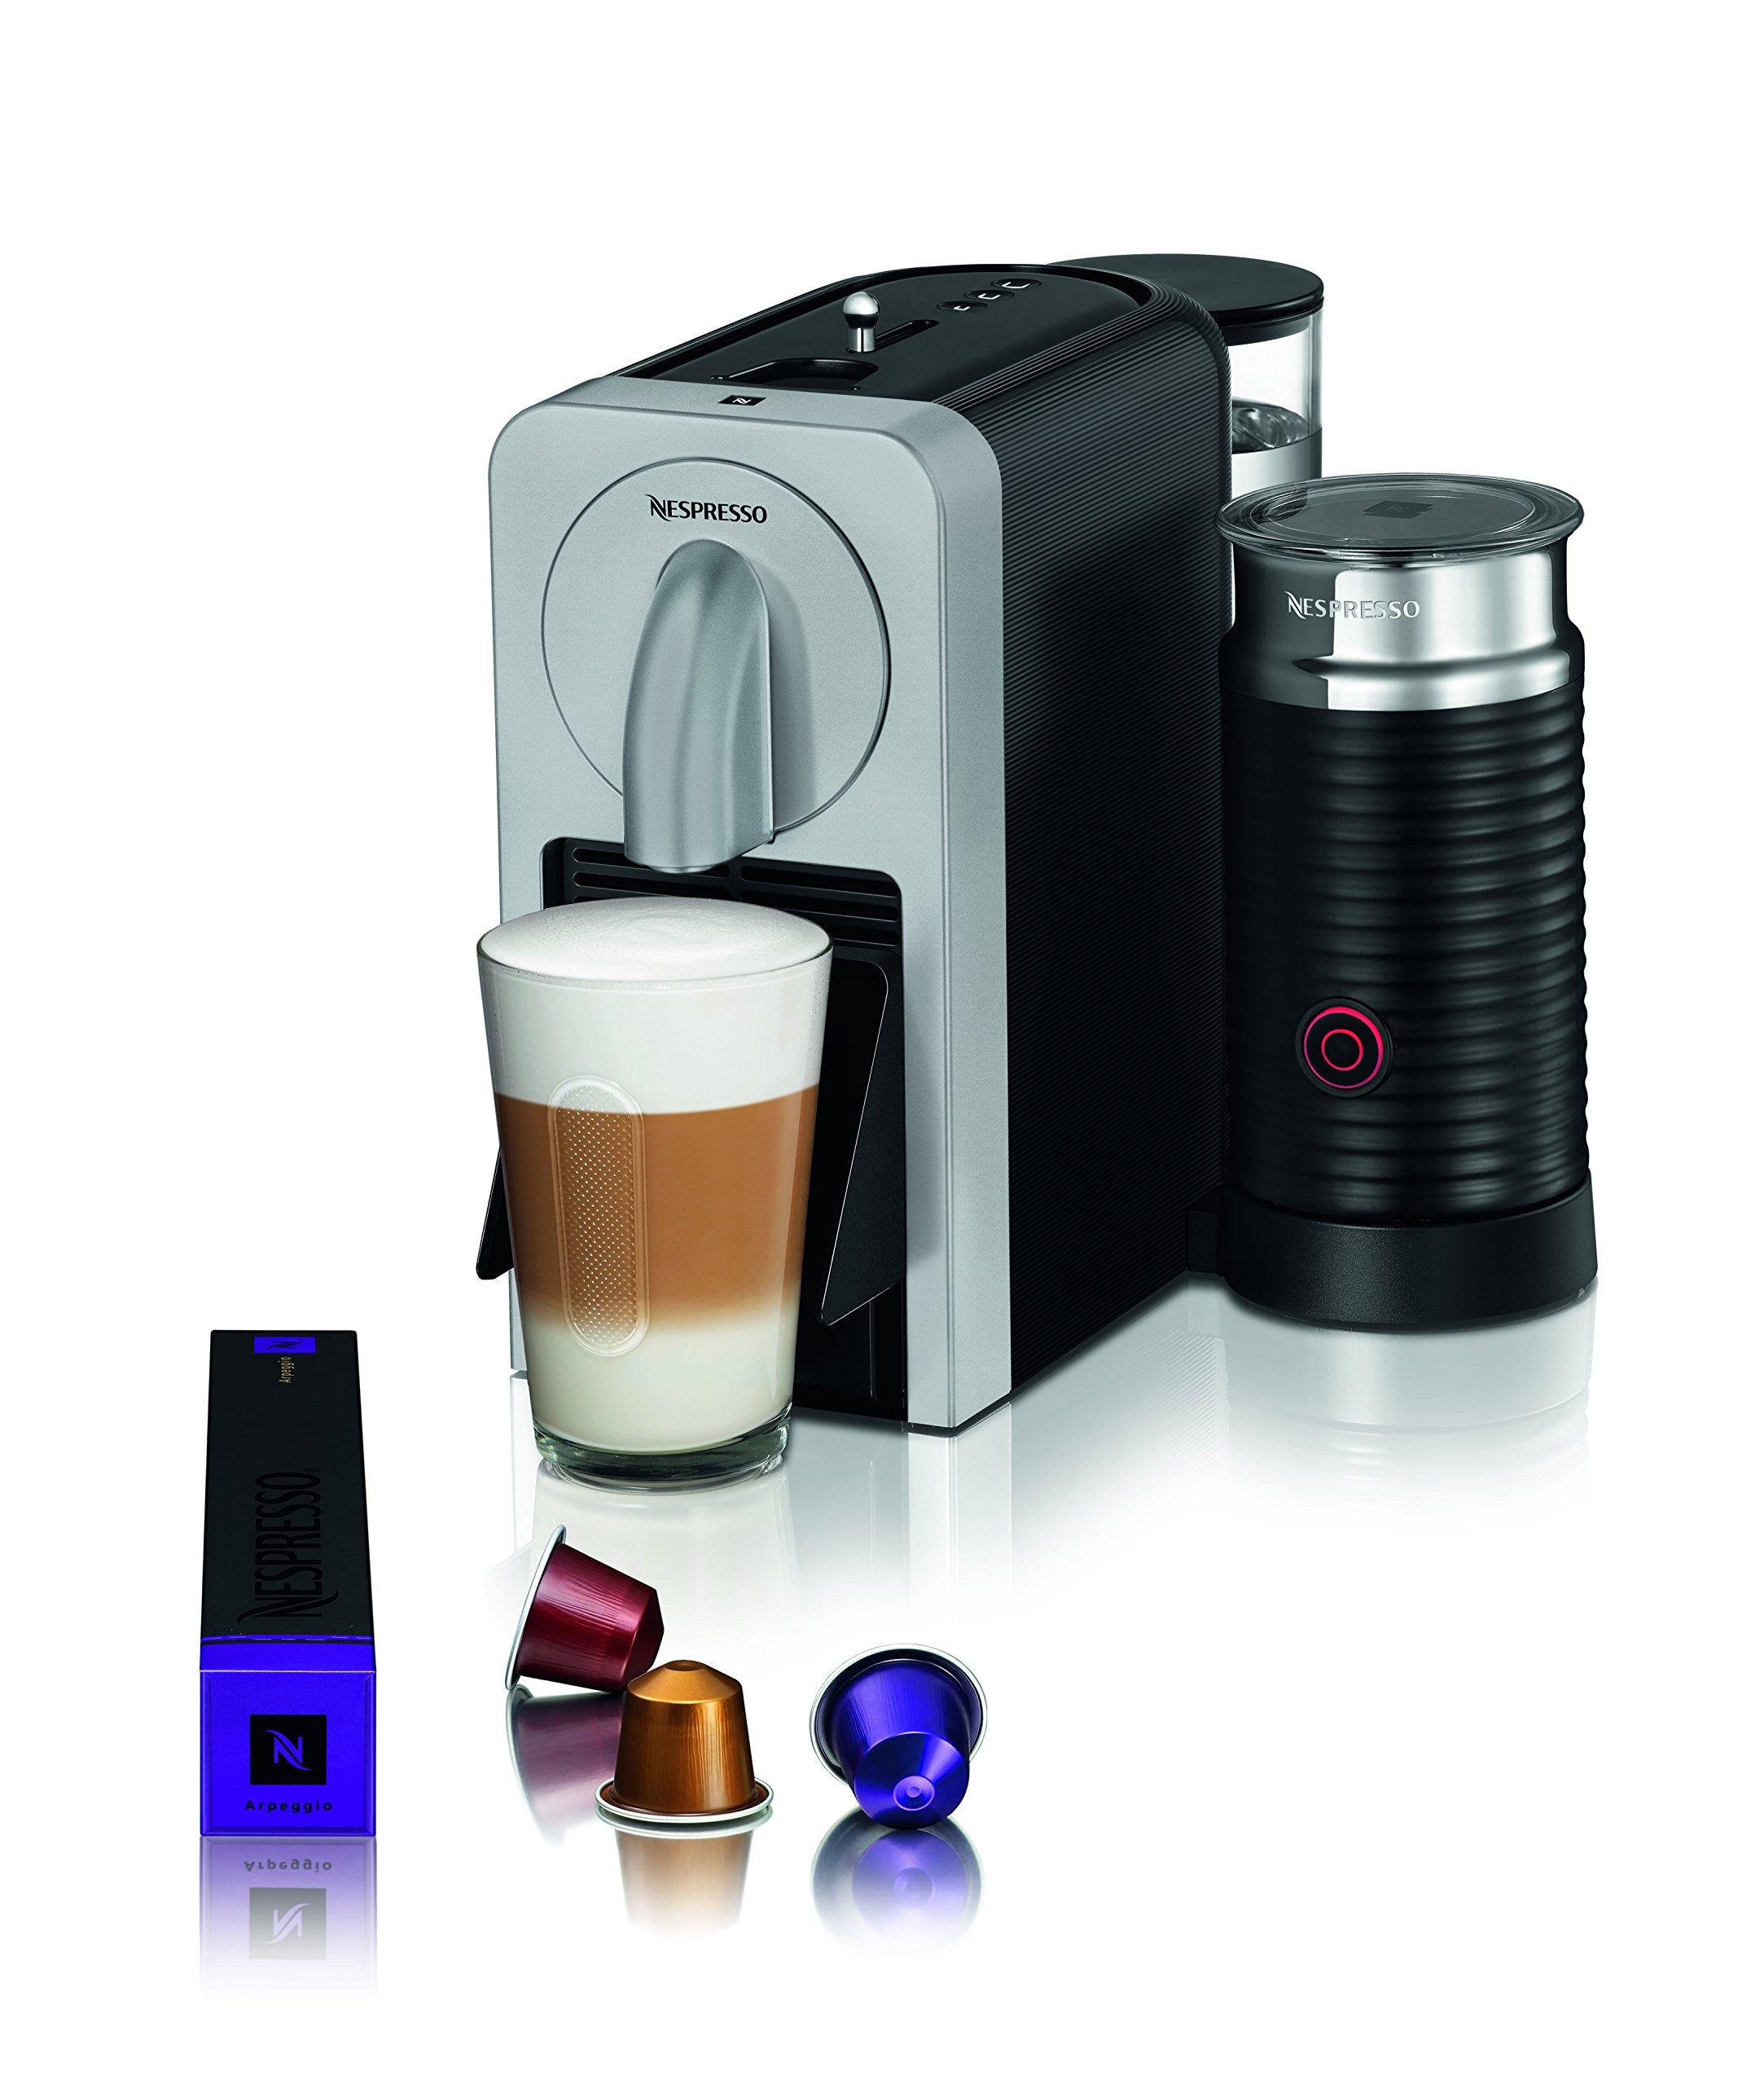 Nespresso D75-US-SI-NE Prodigio With Milk Espresso Maker, Silver by Nestle Nespresso